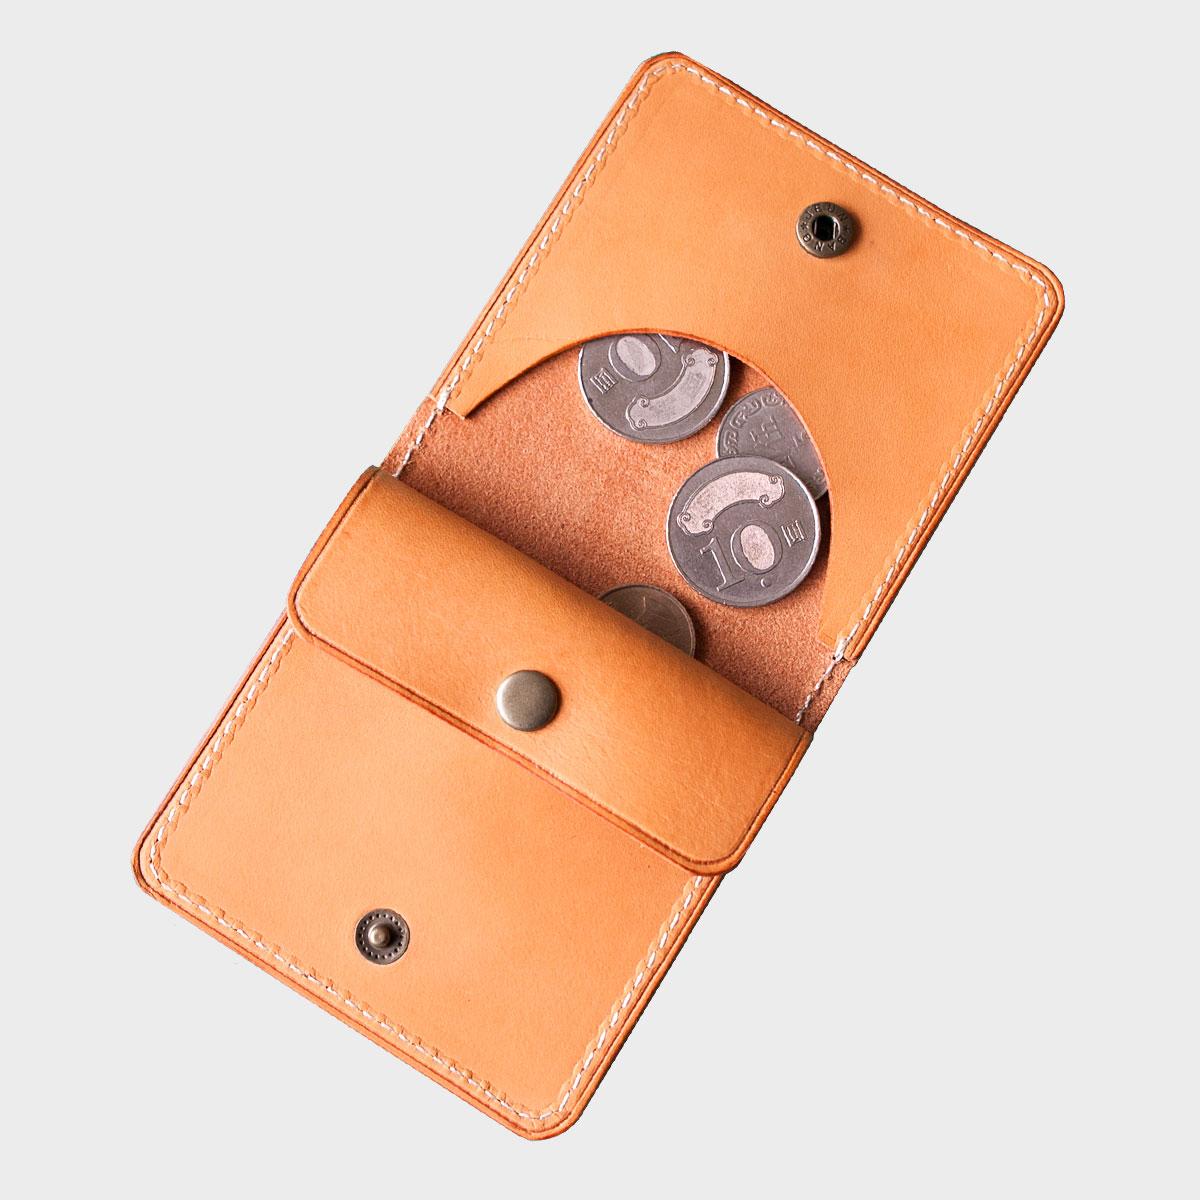 摺蓋零錢包 Flip Coin Case    NT$ 1,880  HDB1016